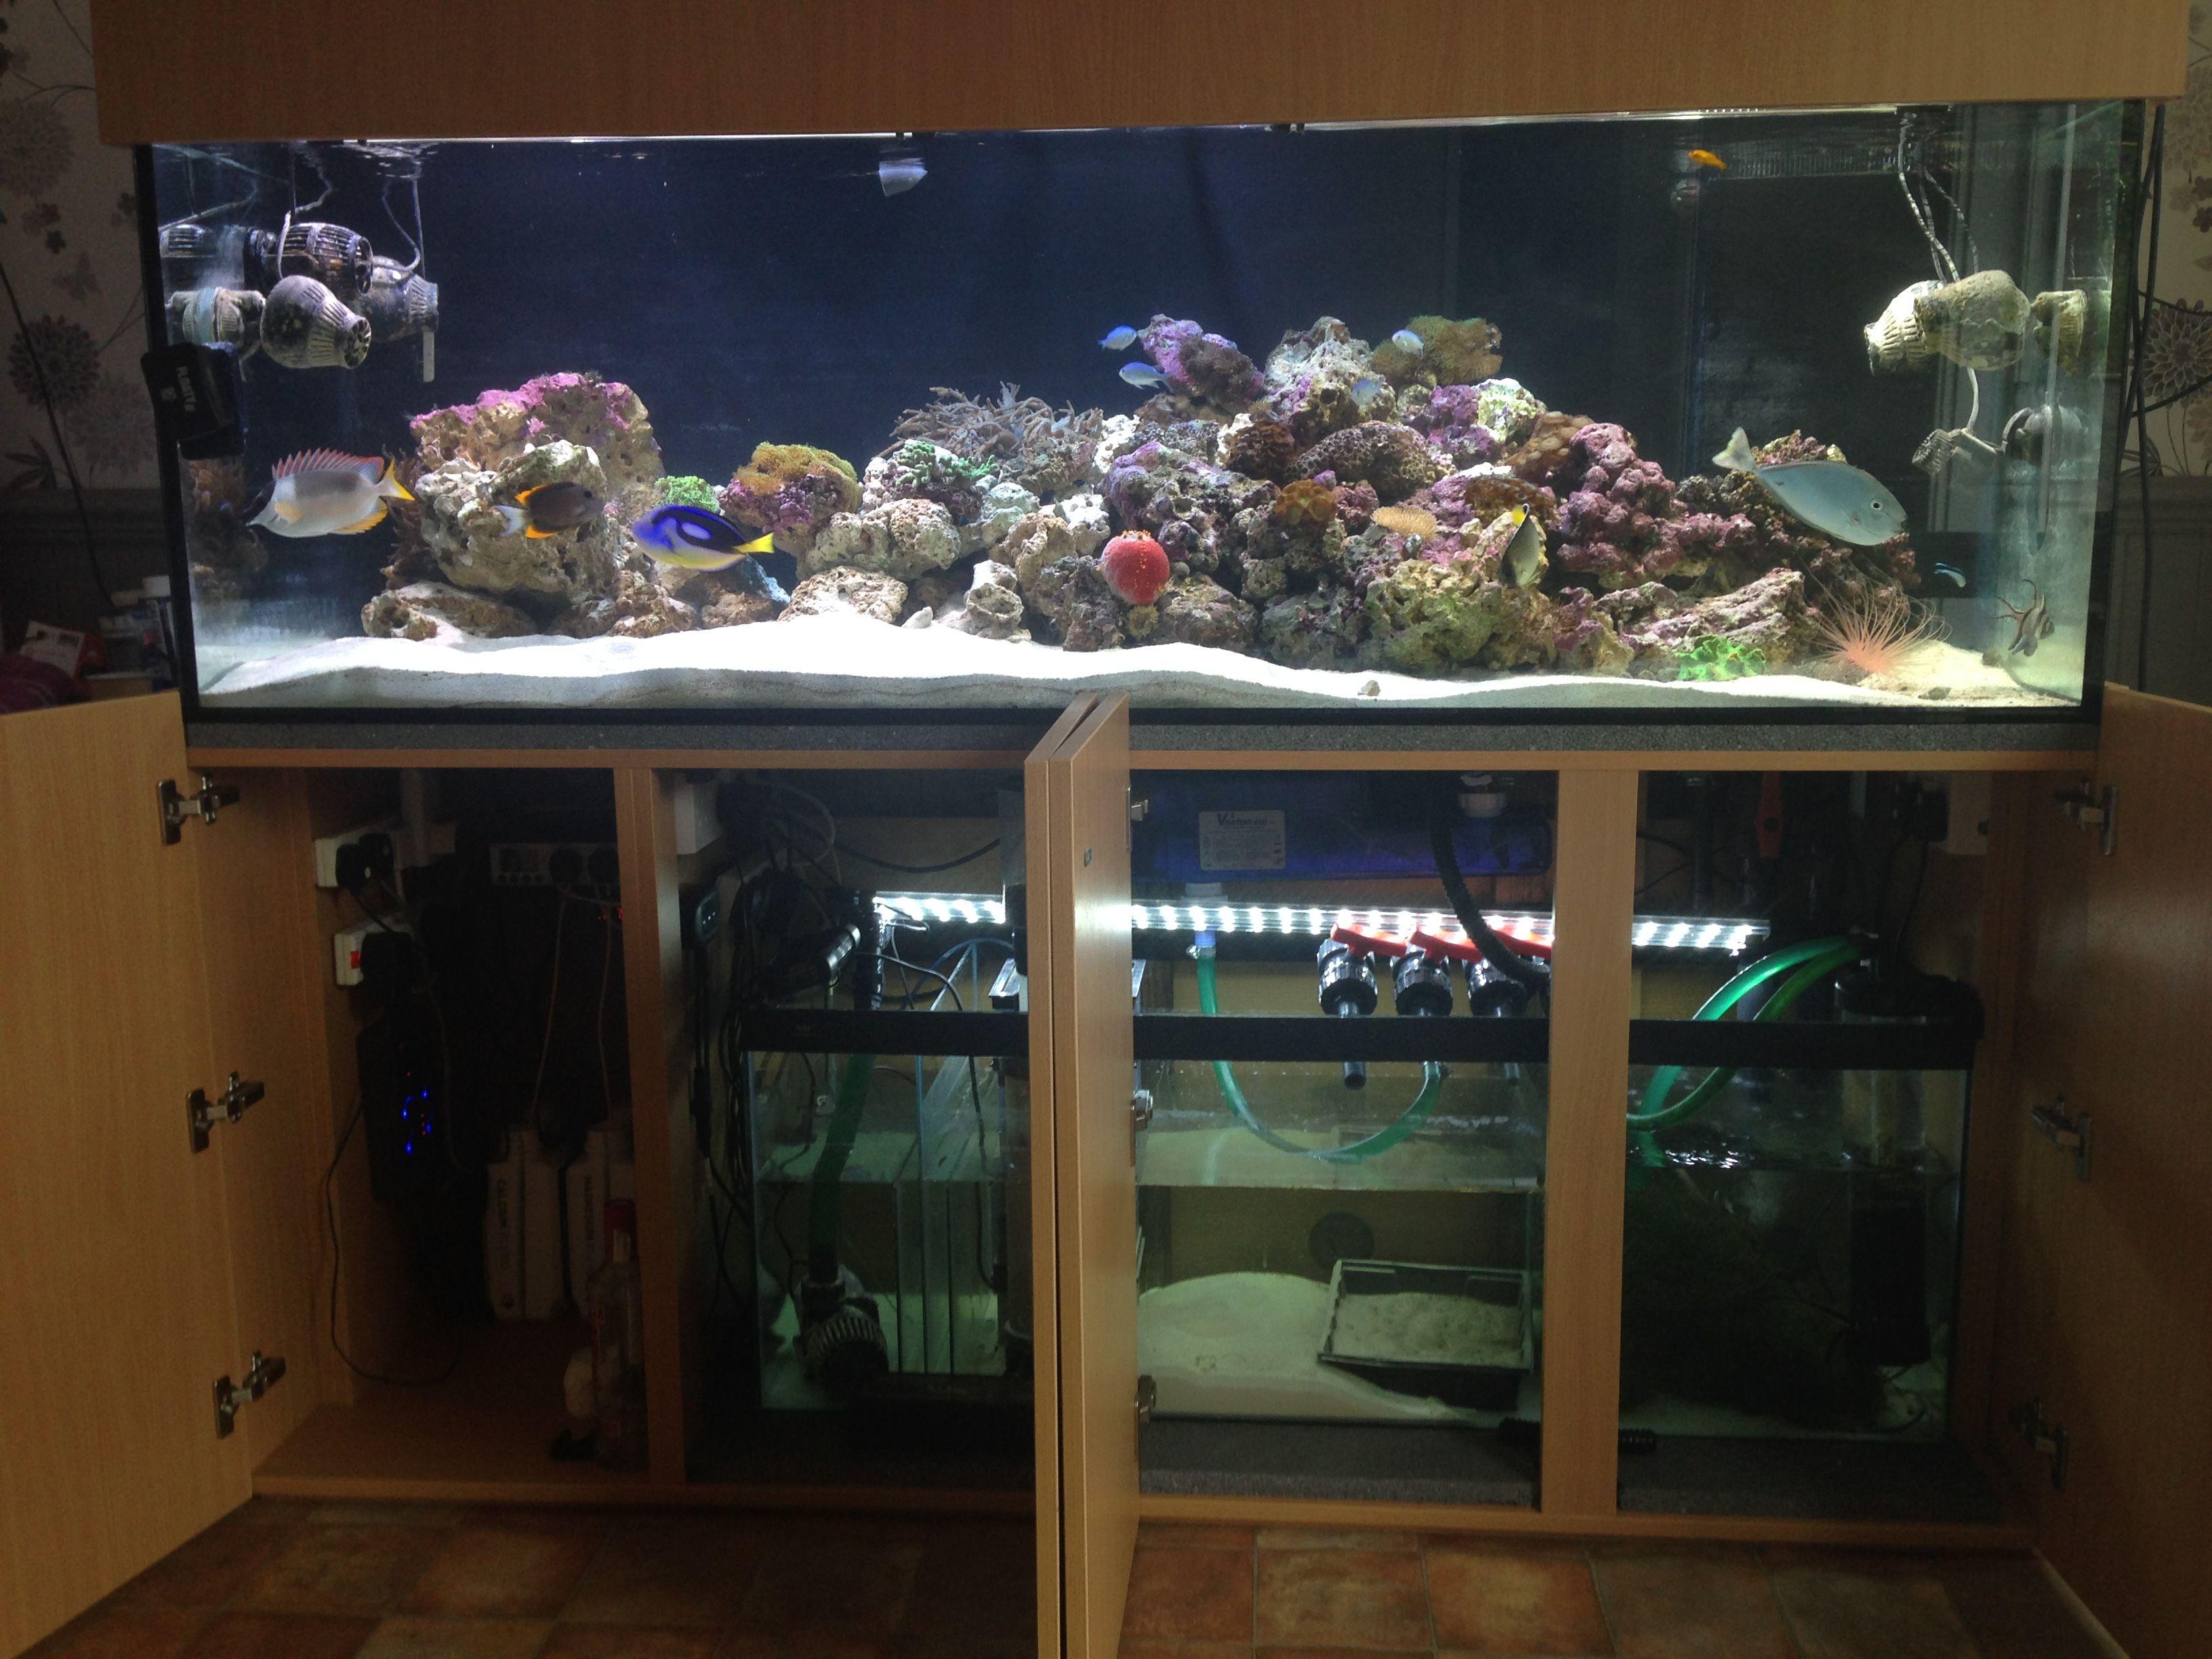 Marine Aquarium 72x24x24 With Doors Open, Modern Cabinet Design.